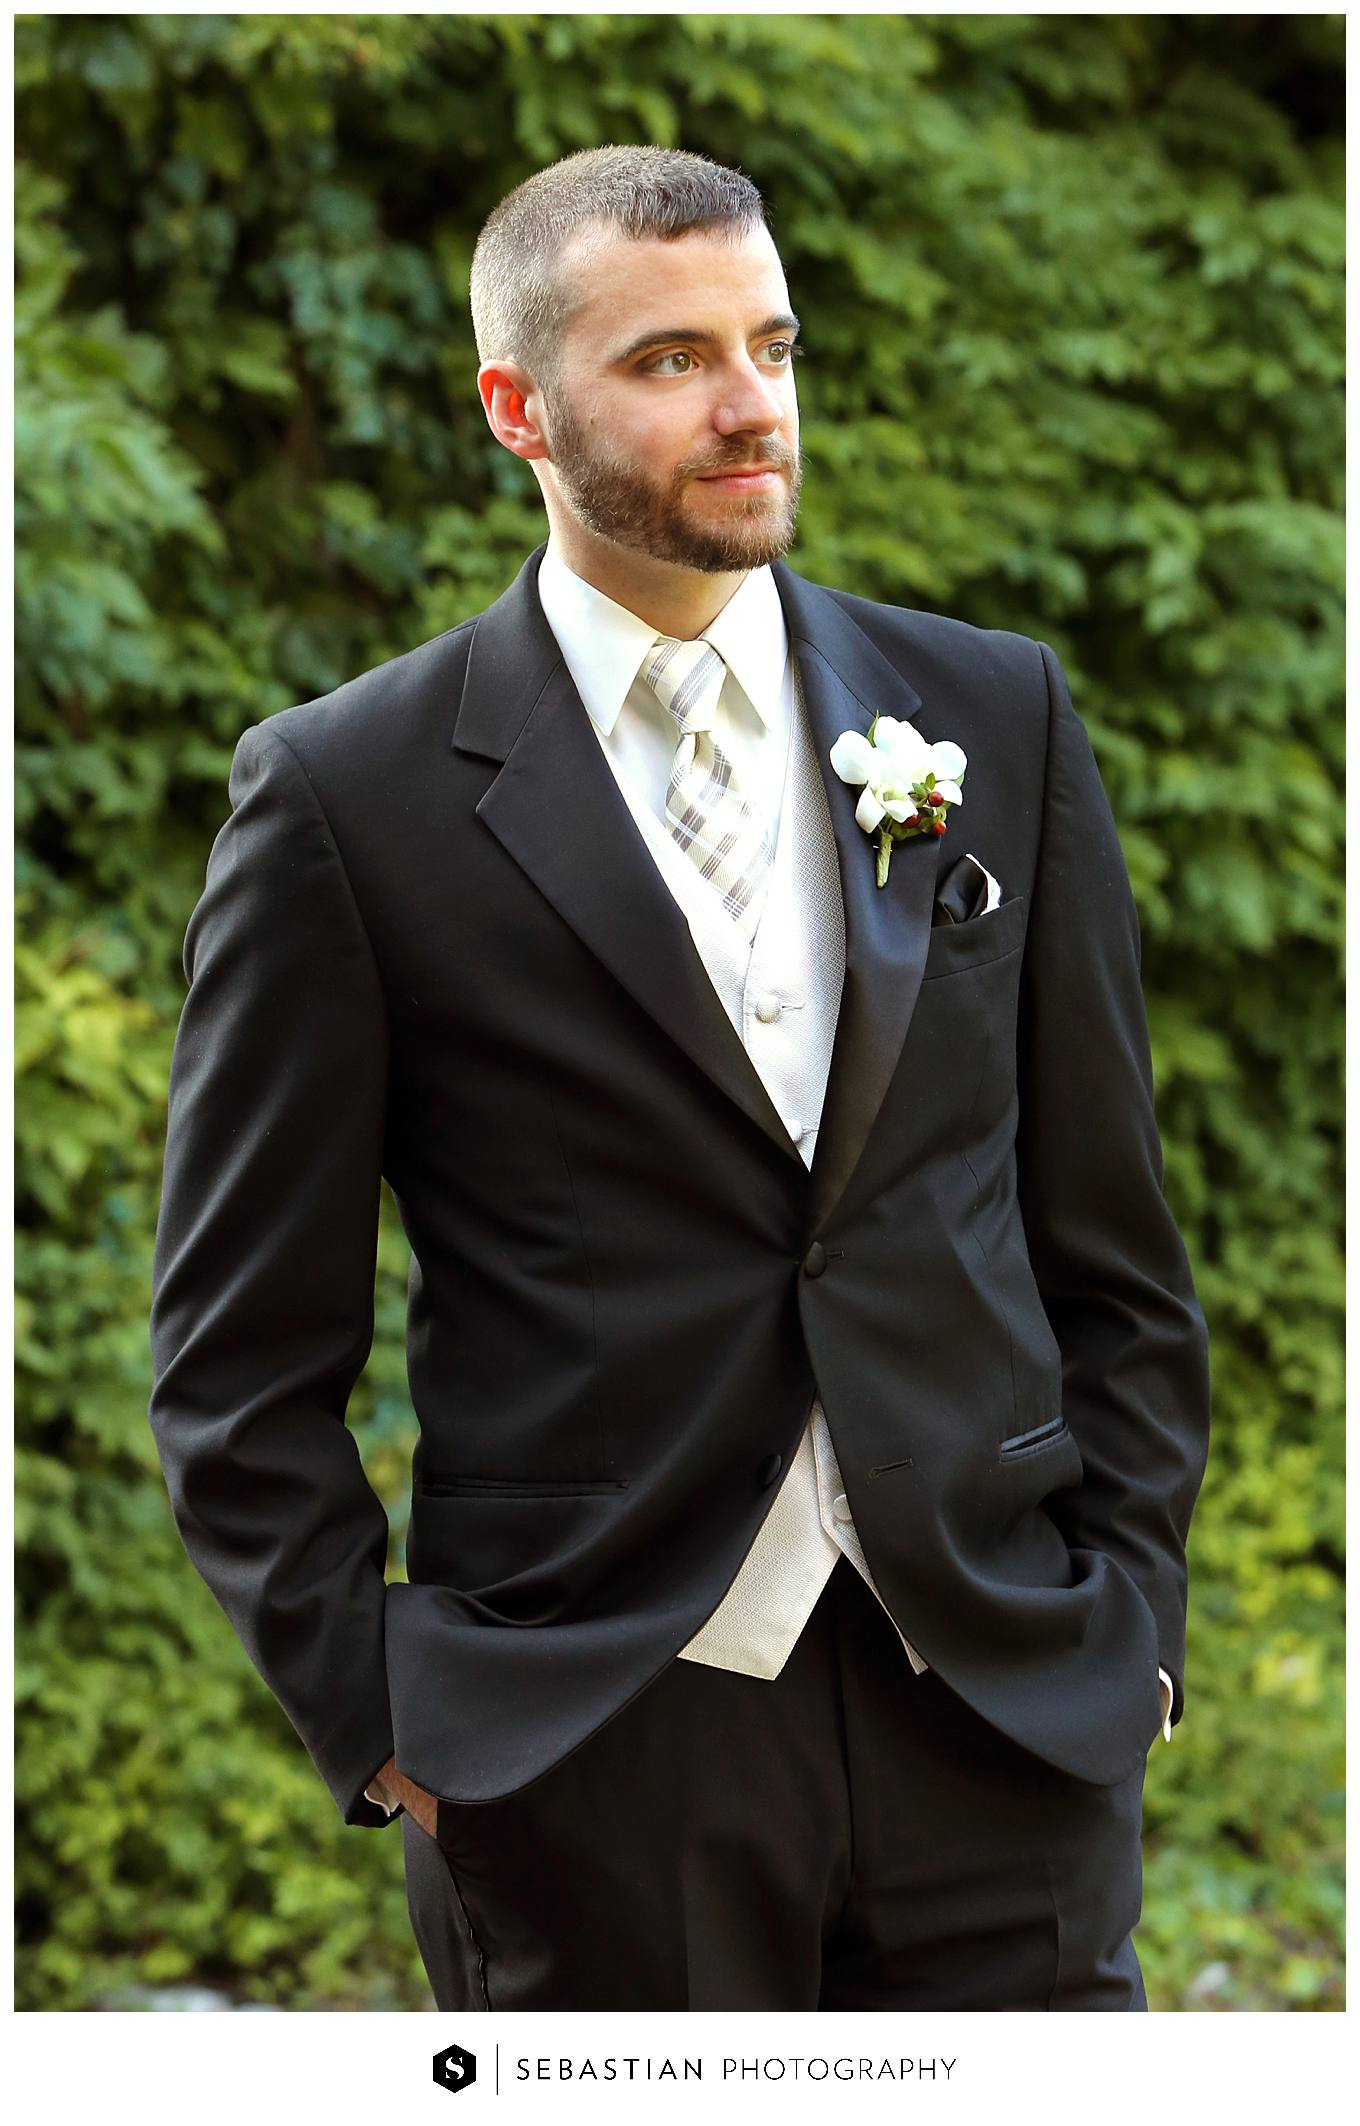 Sebastian Photography_CT Wedding Photographer_SaintClements Wedding_1044.jpg